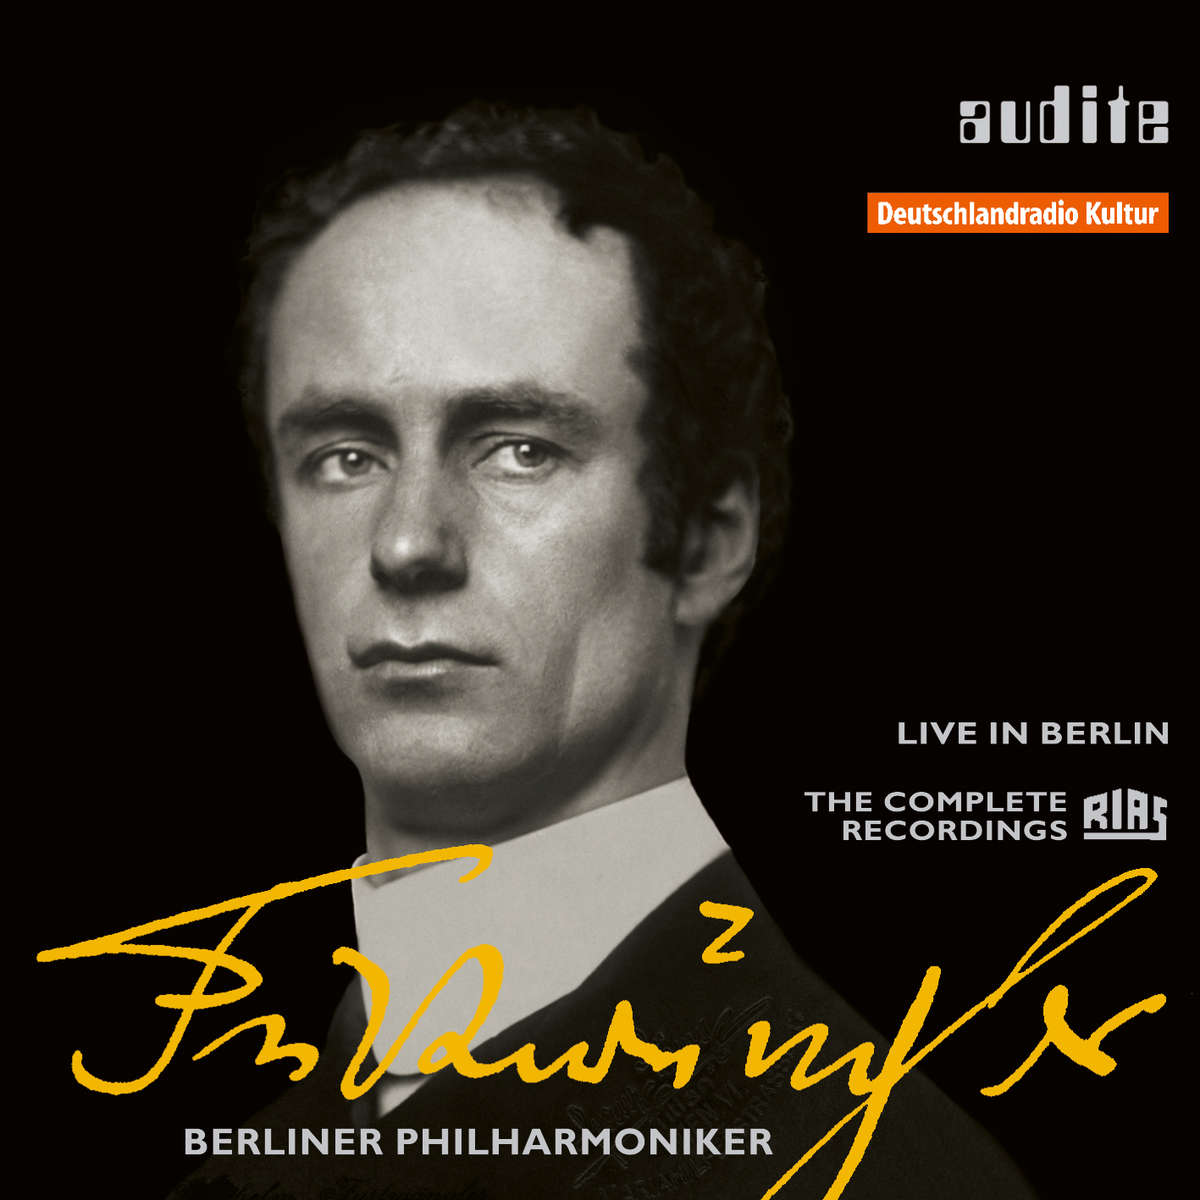 Live in Berlin - Complete Recordings RIAS Berlin - 12 CD + DVD image